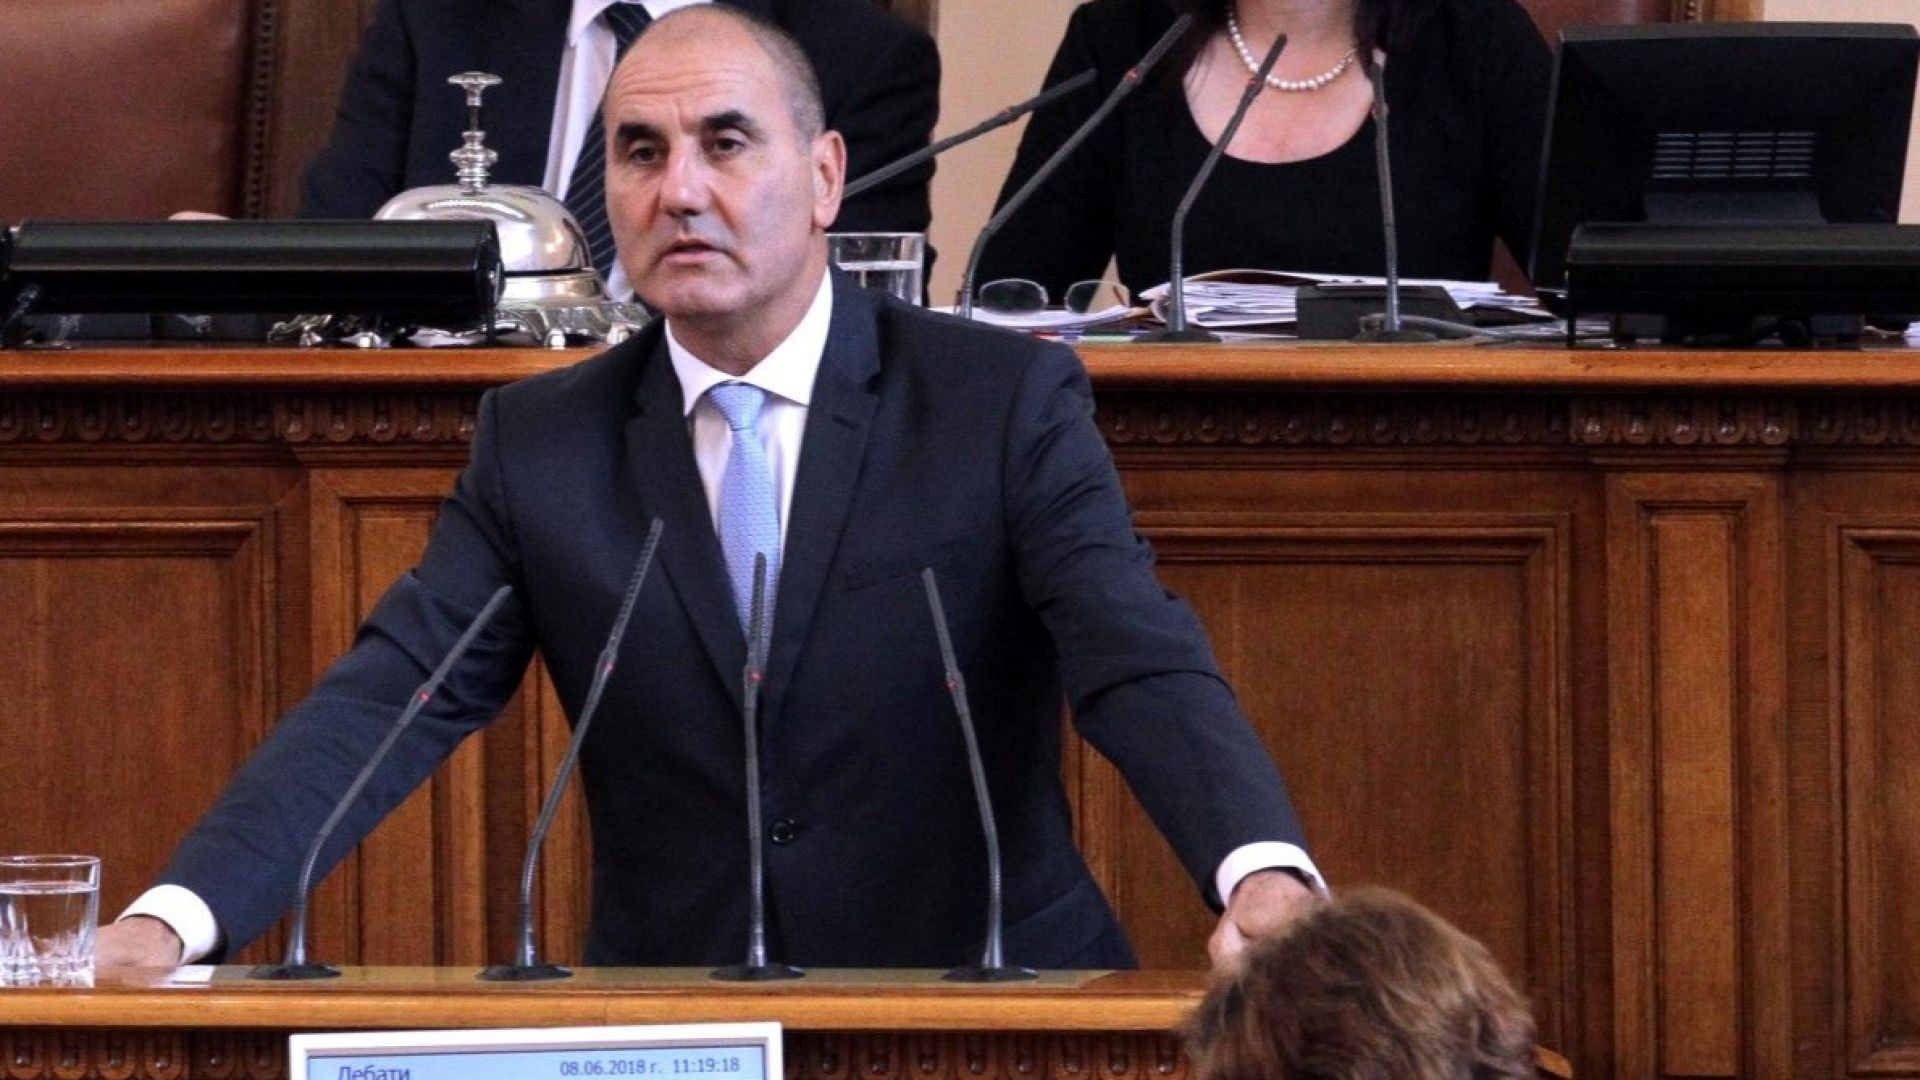 ГЕРБ подкрепя ВМРО за ромите